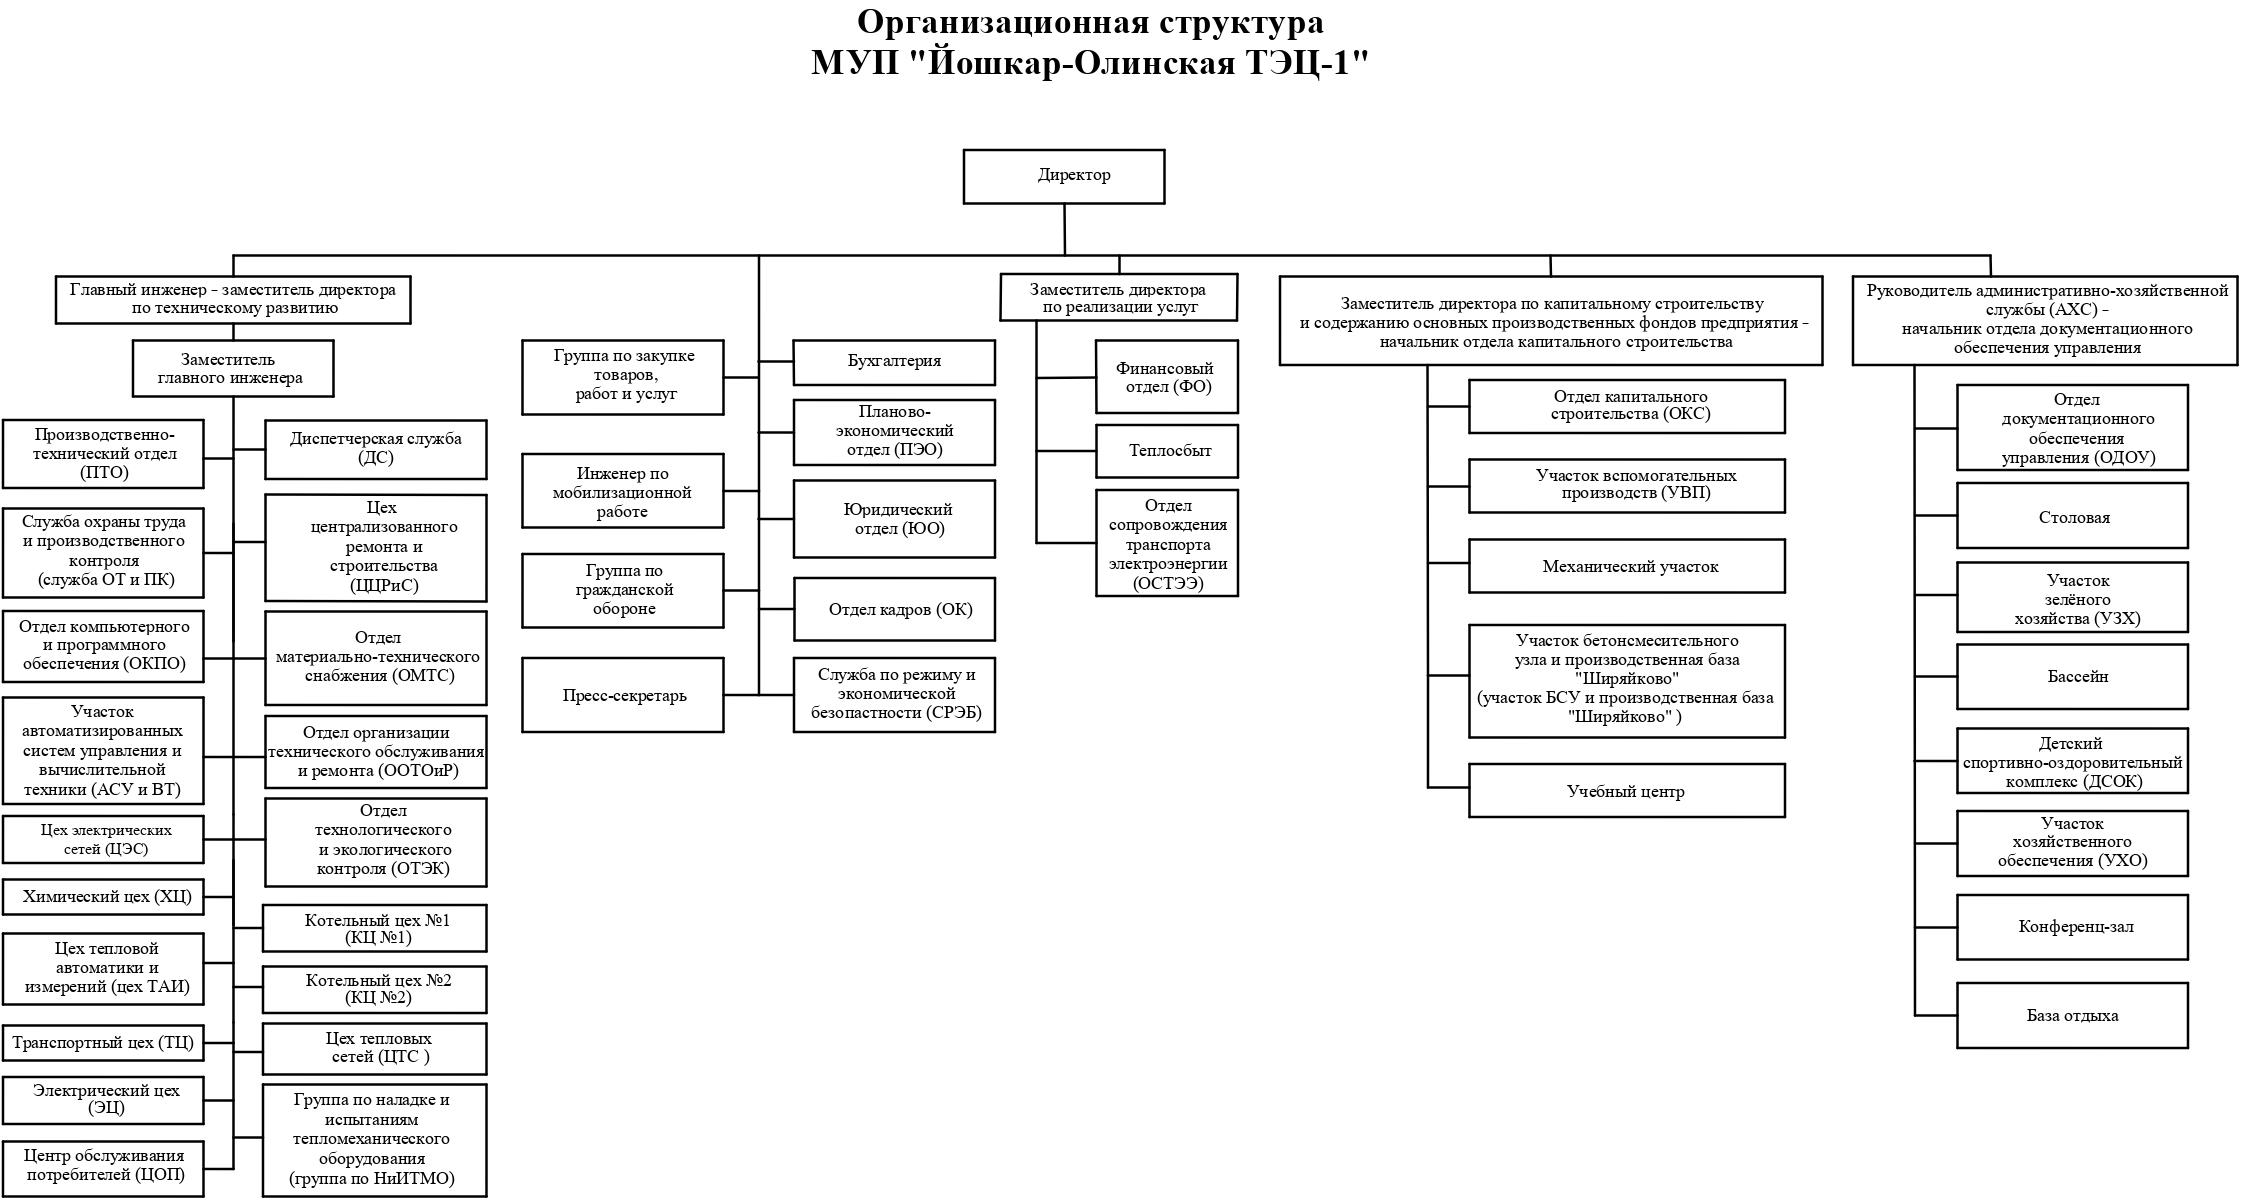 Организационая структура предприятия МУП Йошкар-Олинской ТЭЦ-1